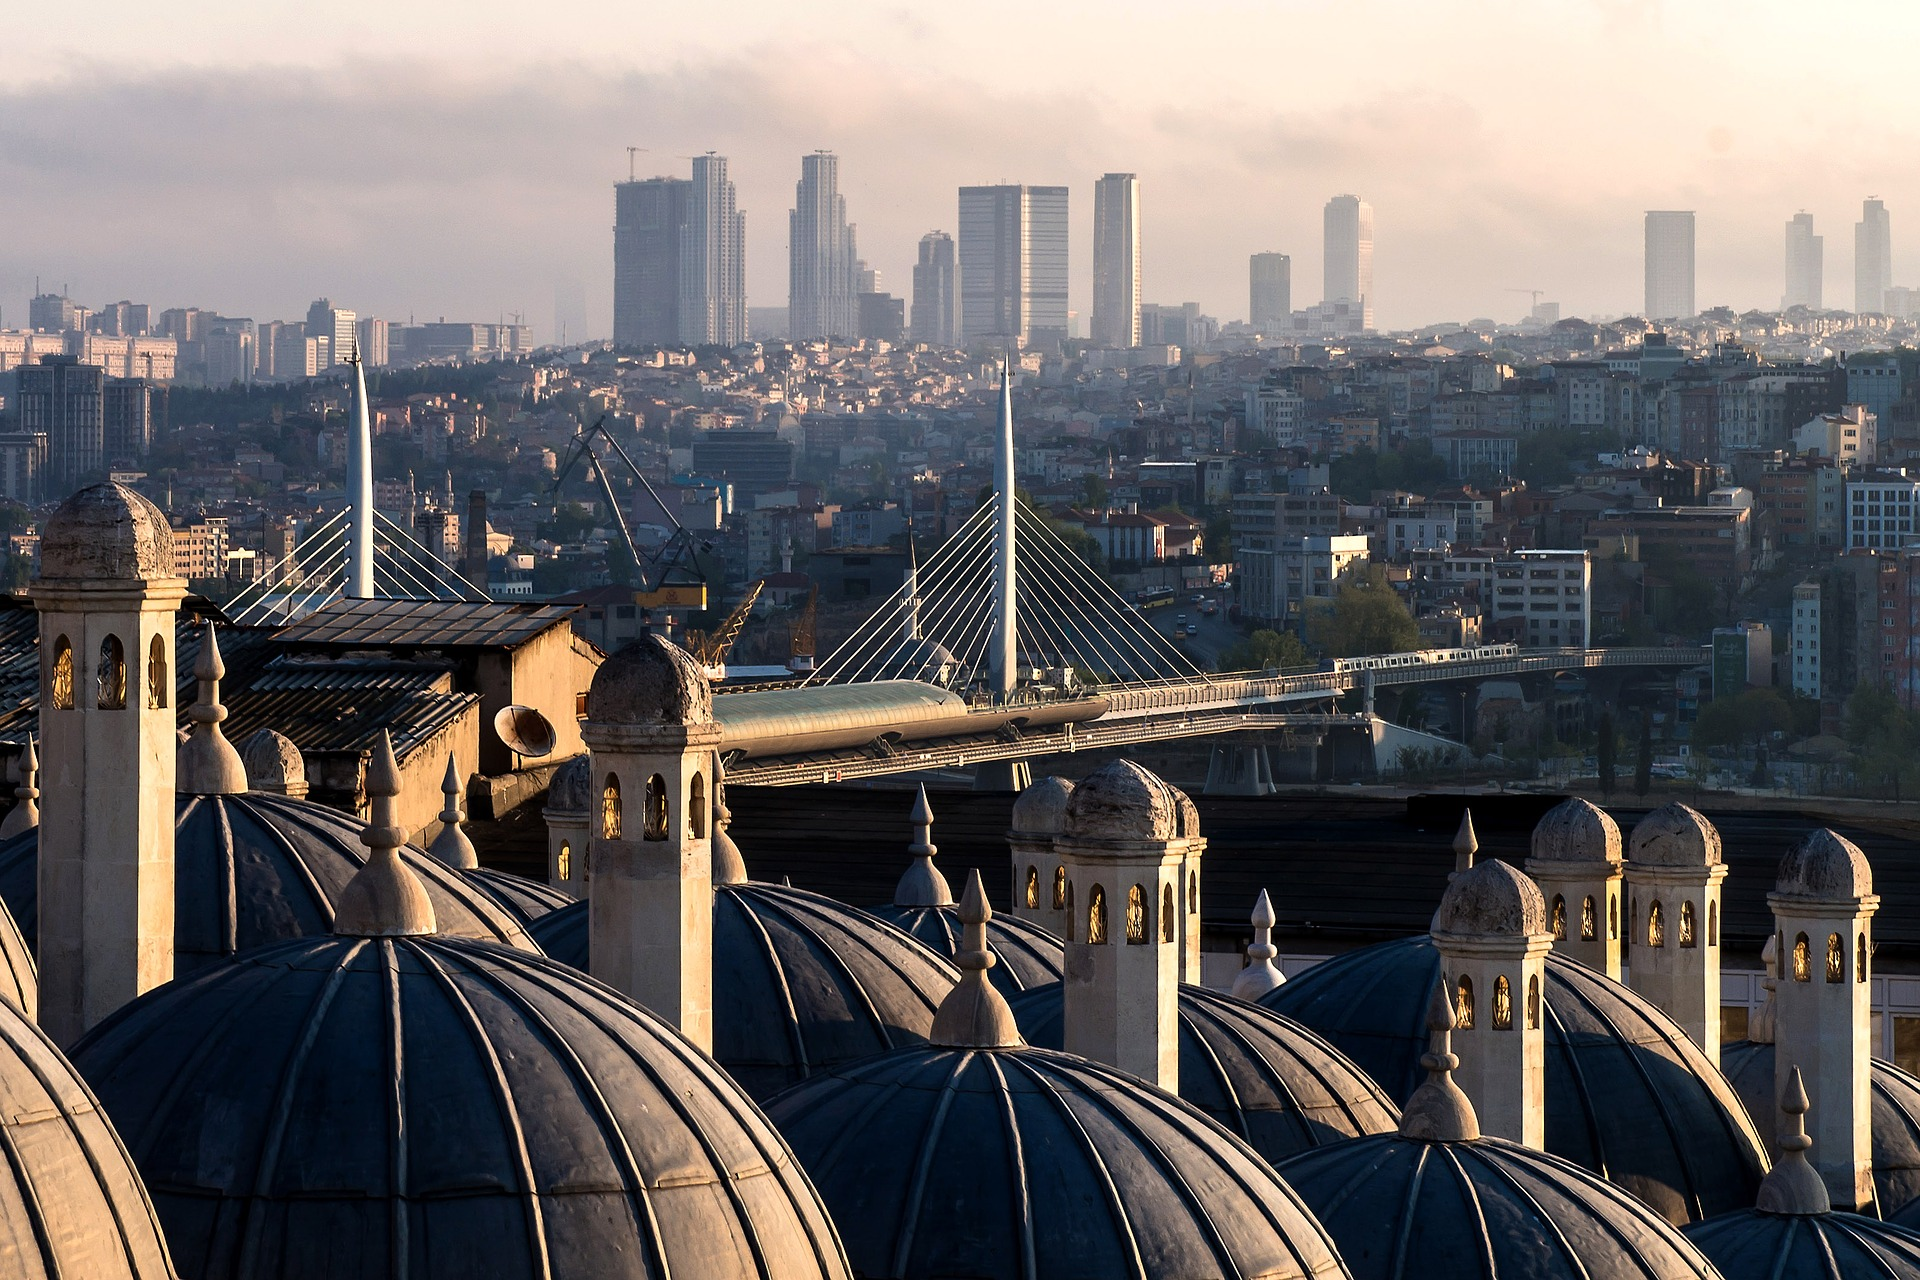 istanbul-3387049_1920.jpg